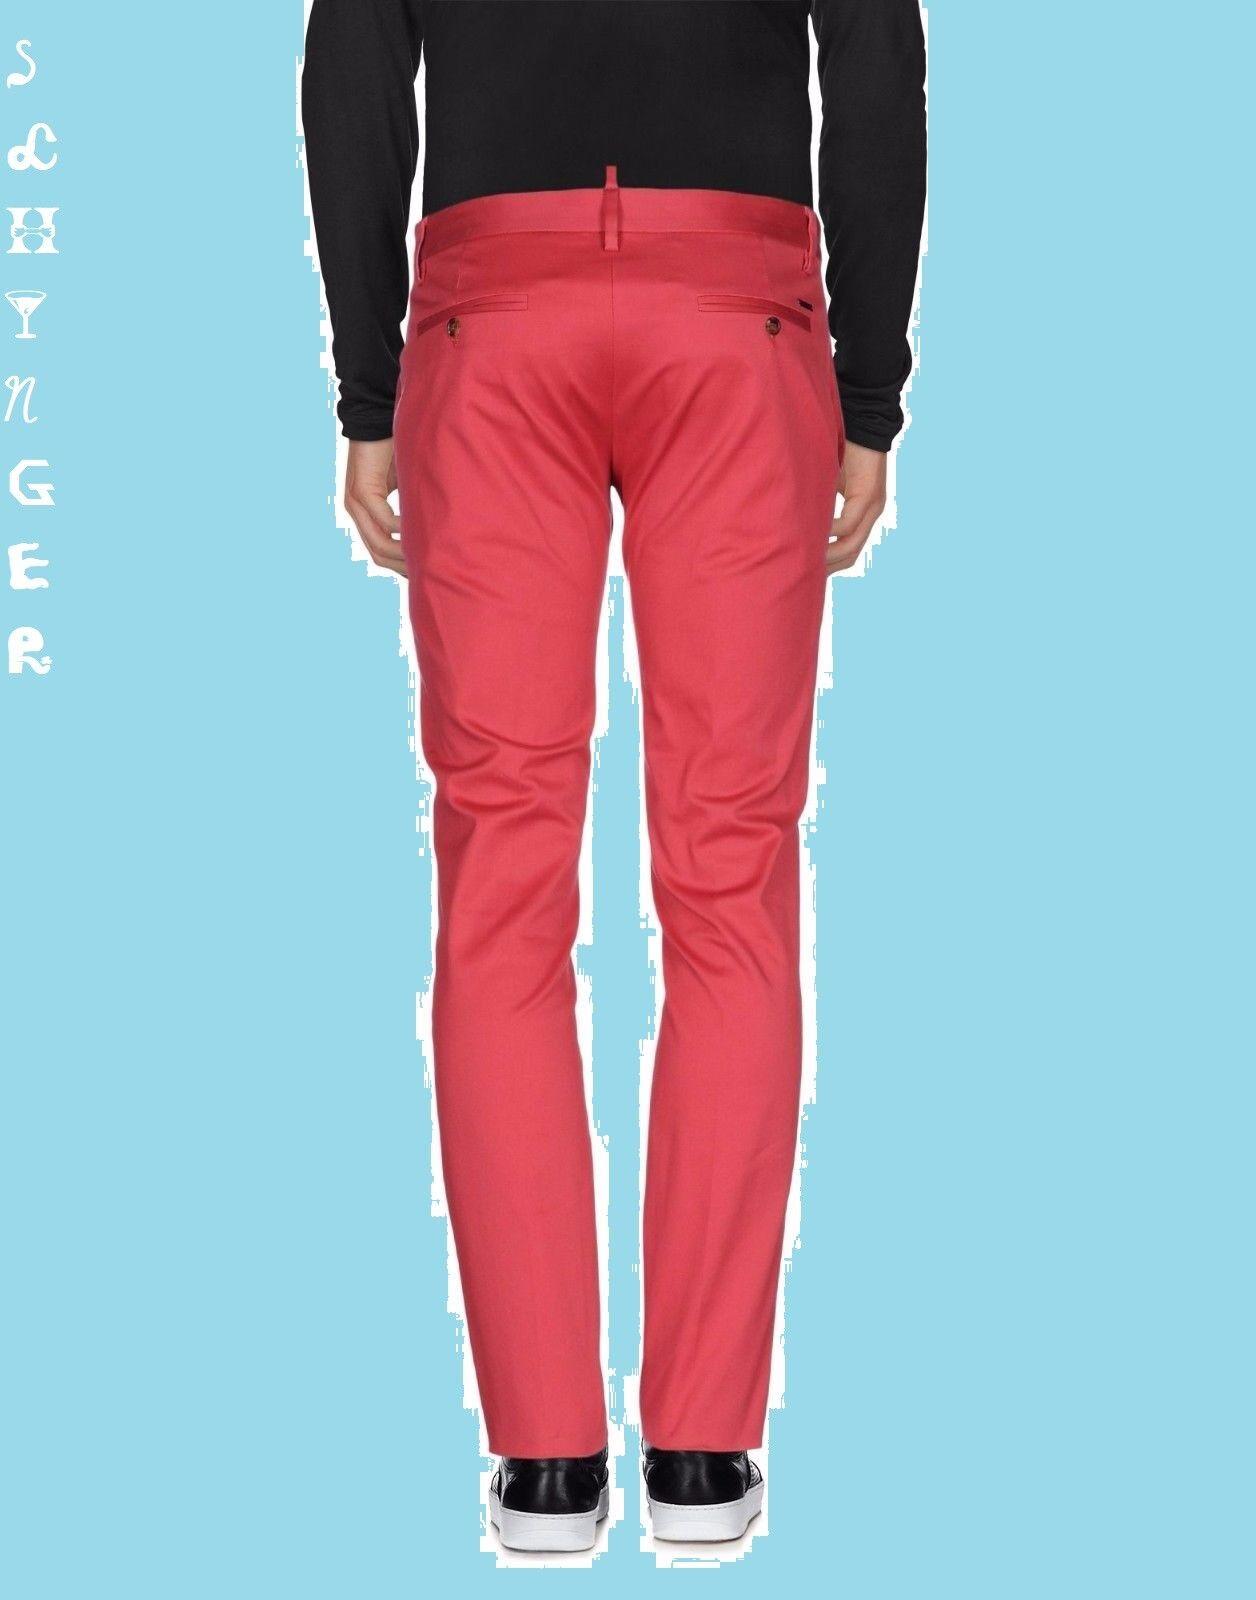 DSQUARED2 DSQUARED2 DSQUARED2 PANTALONES rossoS Dimensione 50 PANTS TROUSERS 27b296